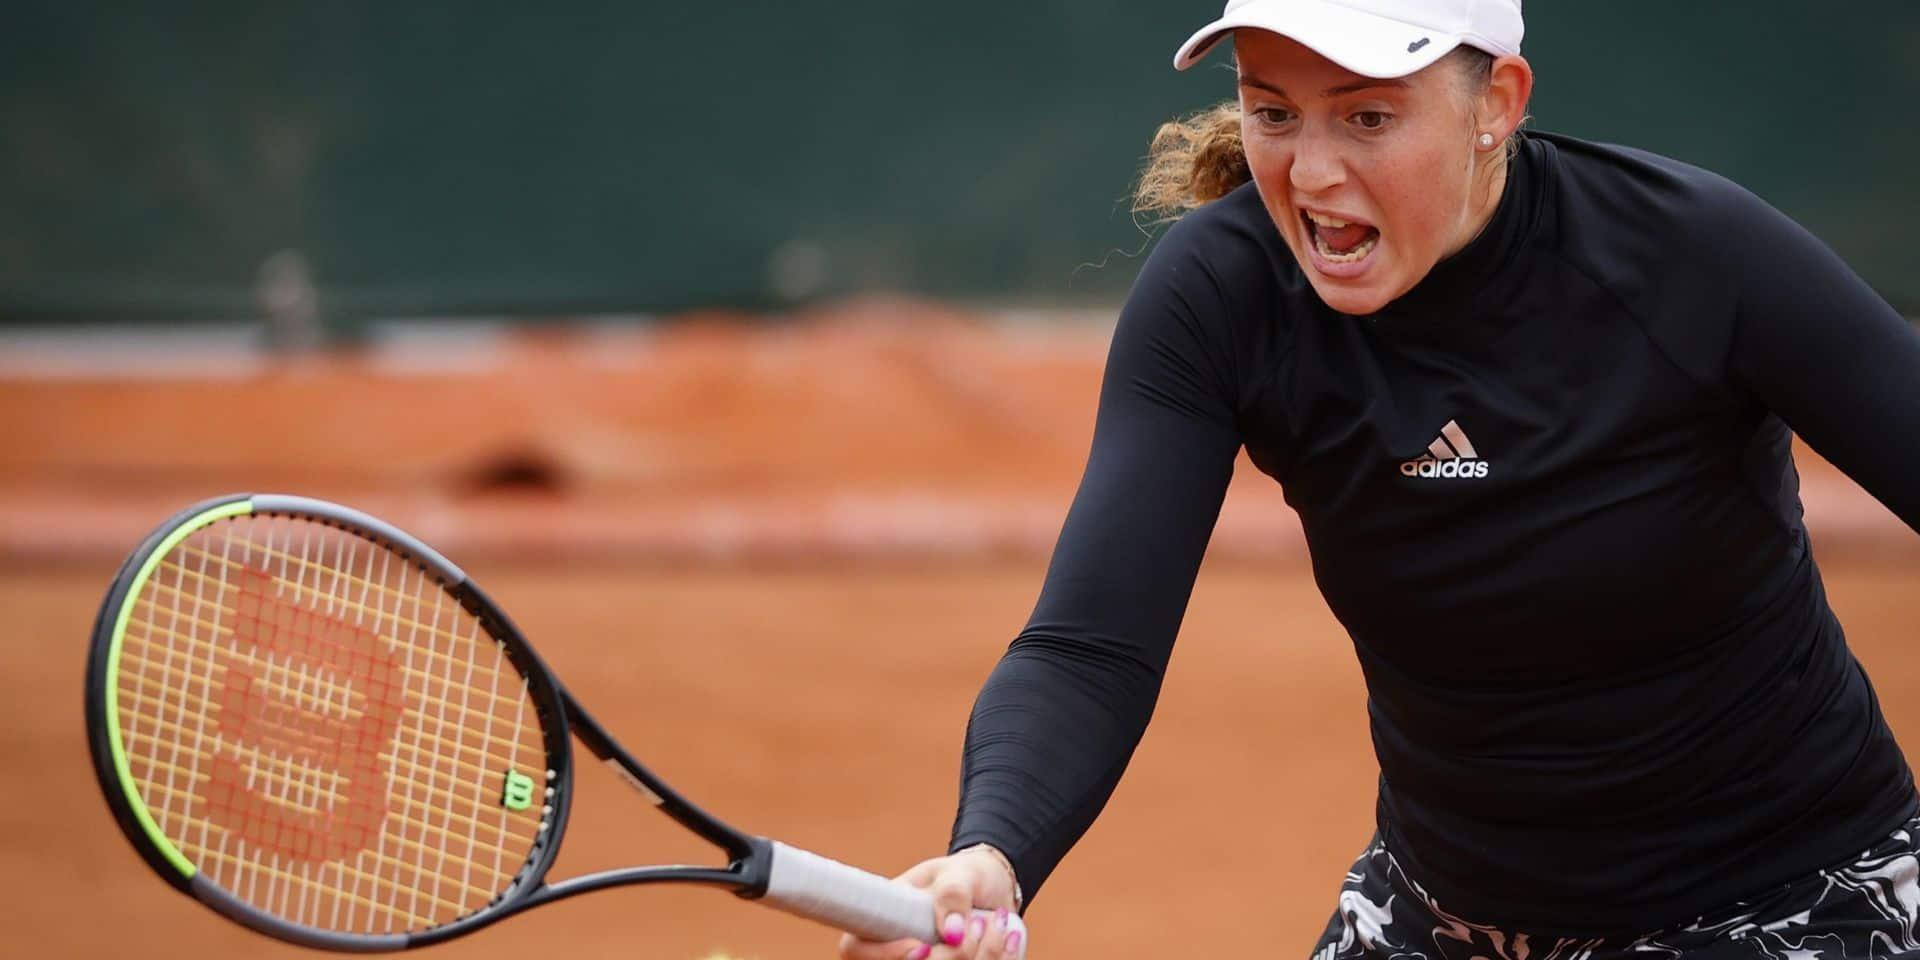 Roland-Garros: ancienne lauréate, Ostapenko élimine facilement la tête de série N.2 Karolina Pliskova